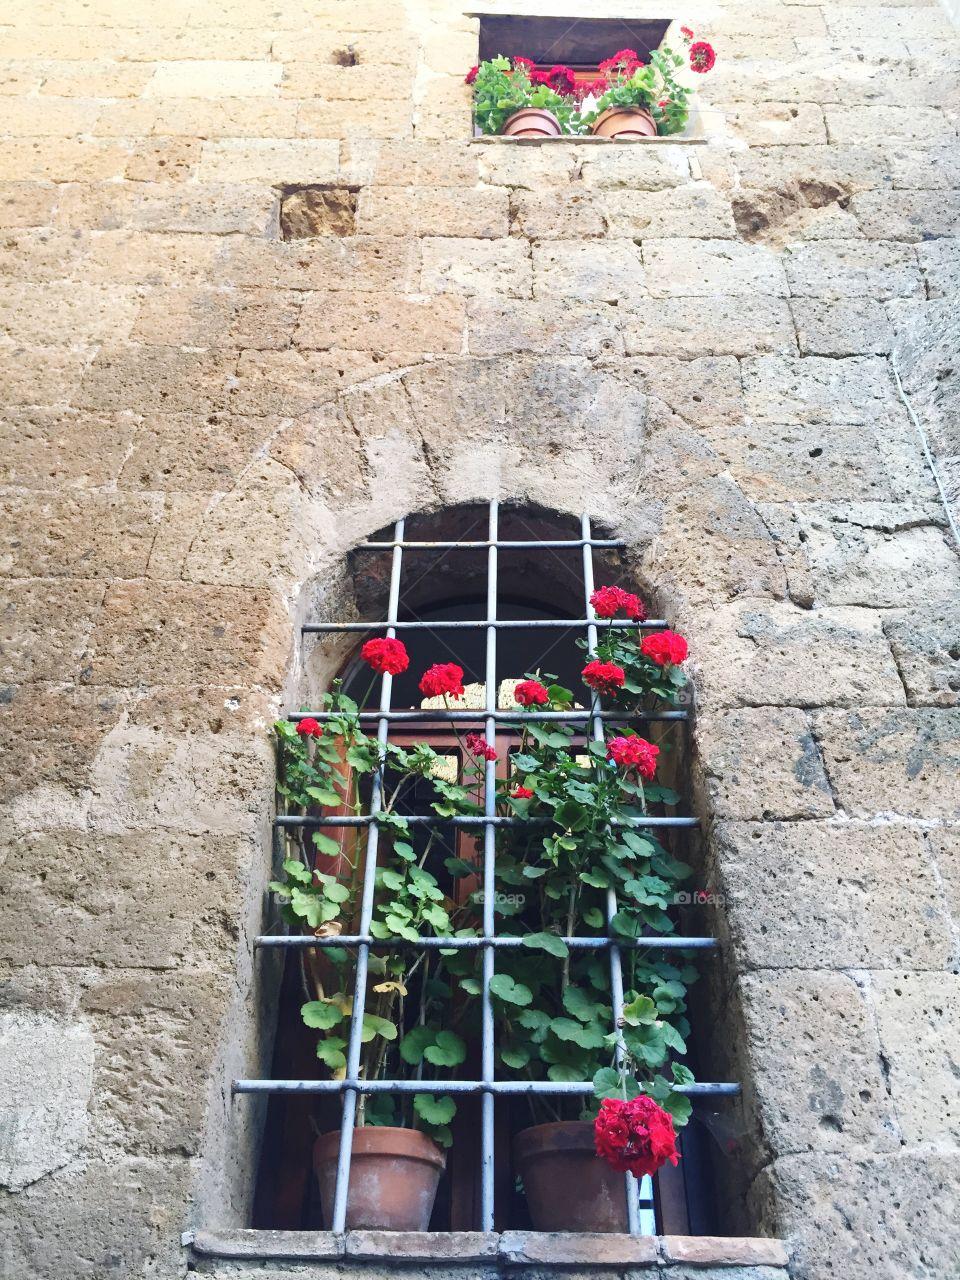 Geraniums on stone wall